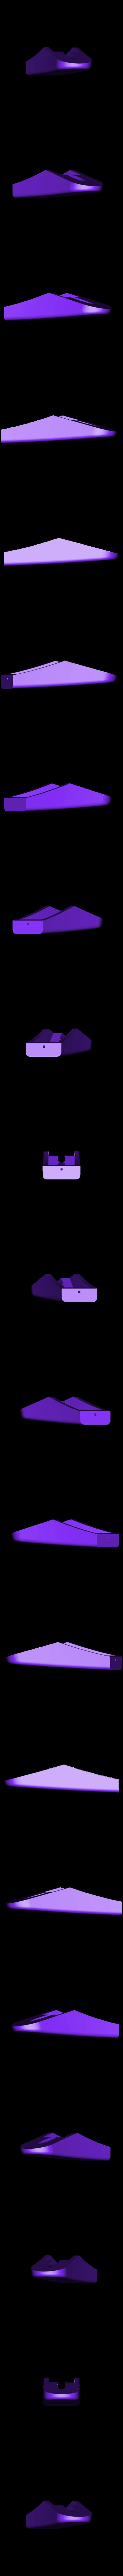 OpenRC_2017_MCL_Nose_Color2.stl Download free STL file OpenRC F1 Dual Color McLaren Edition • 3D printer model, DanielNoree